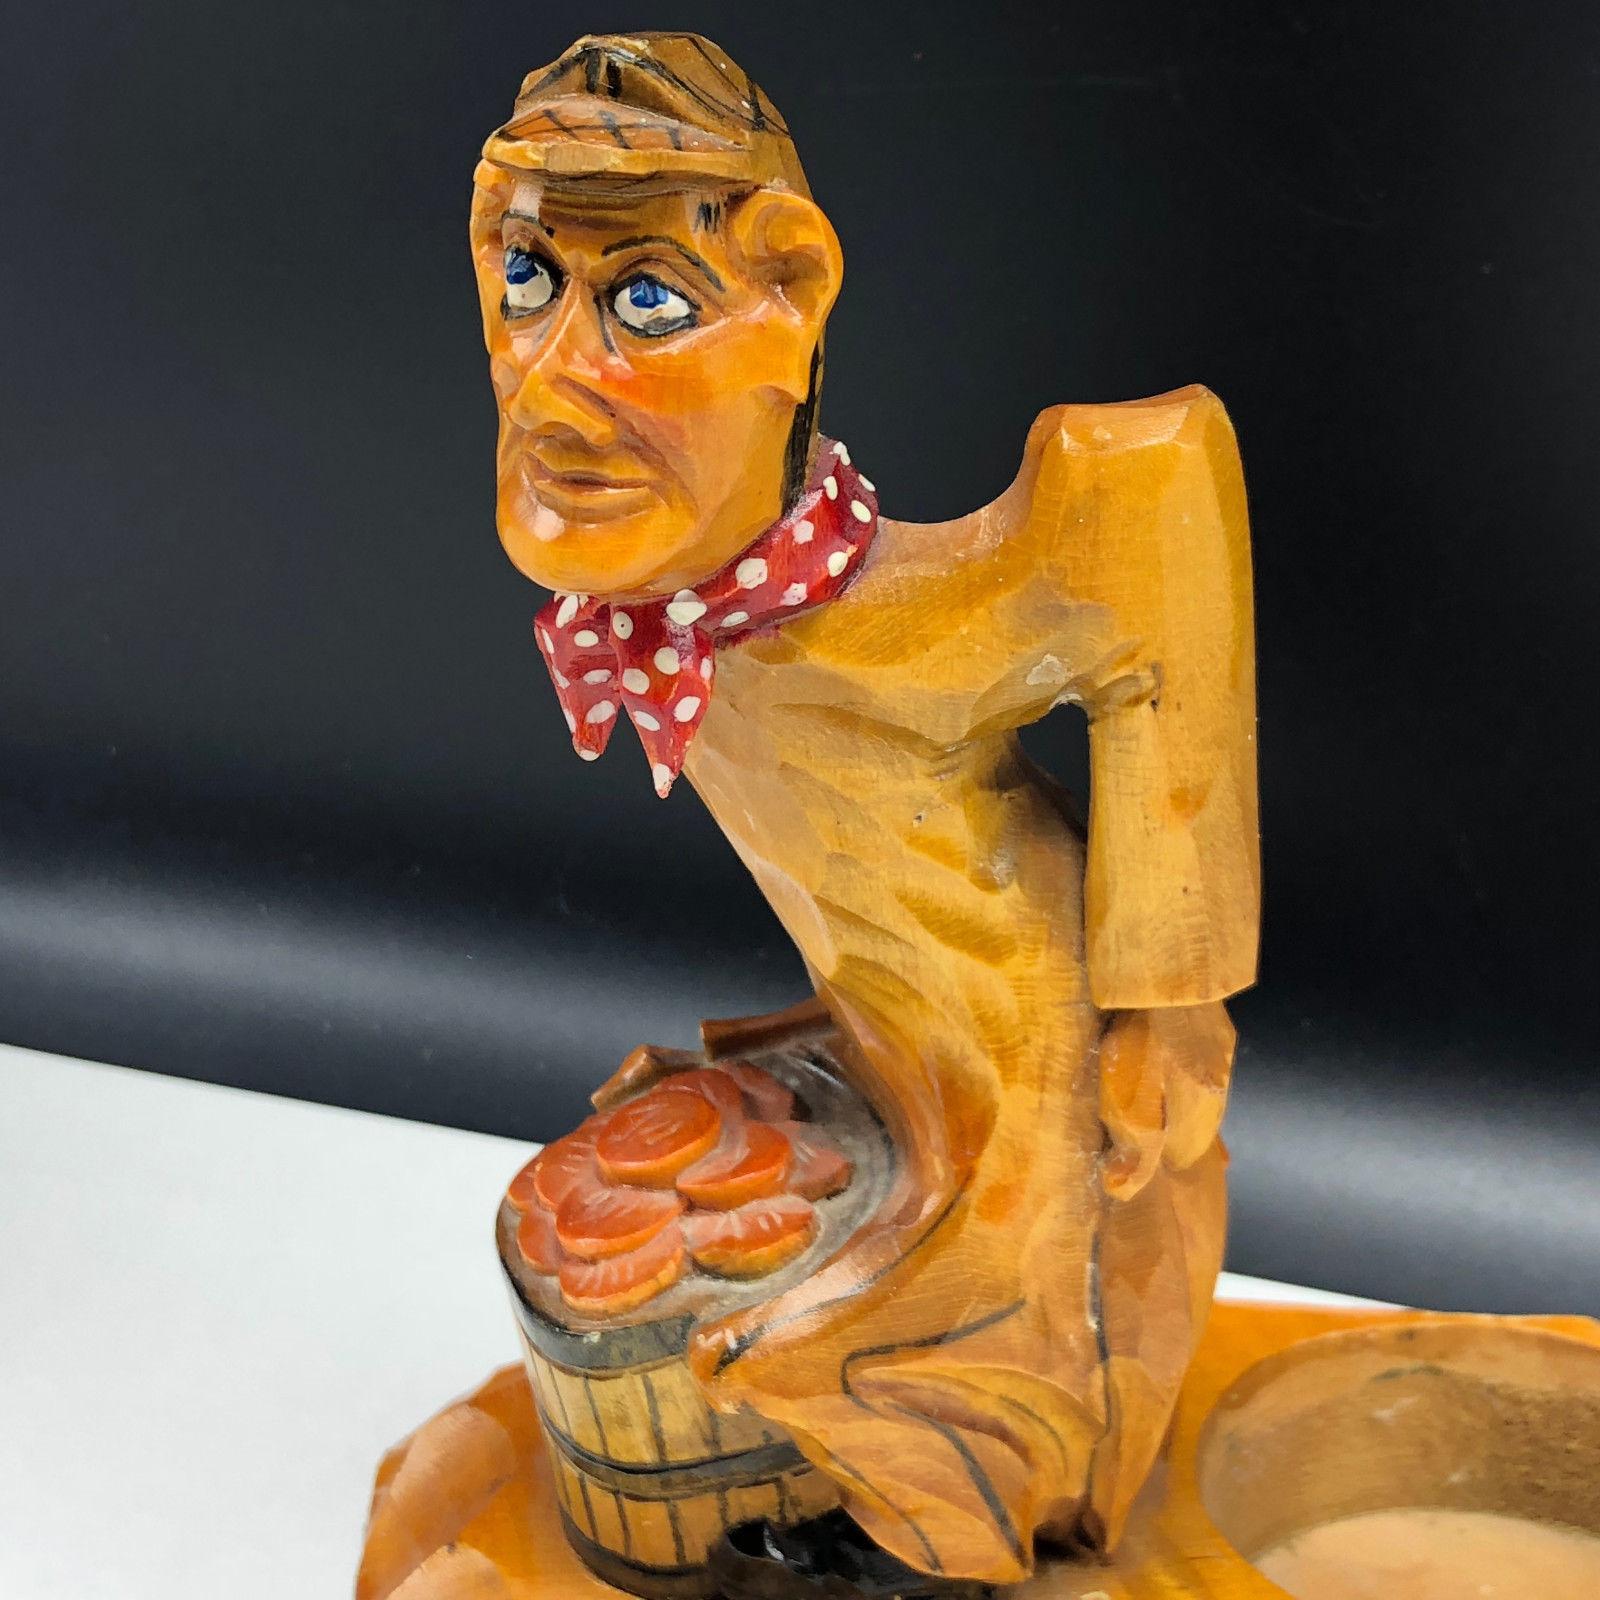 KREUZBERG RHON CARVED GERMANY WOOD FIGURINE statue candle holder butt humor hand